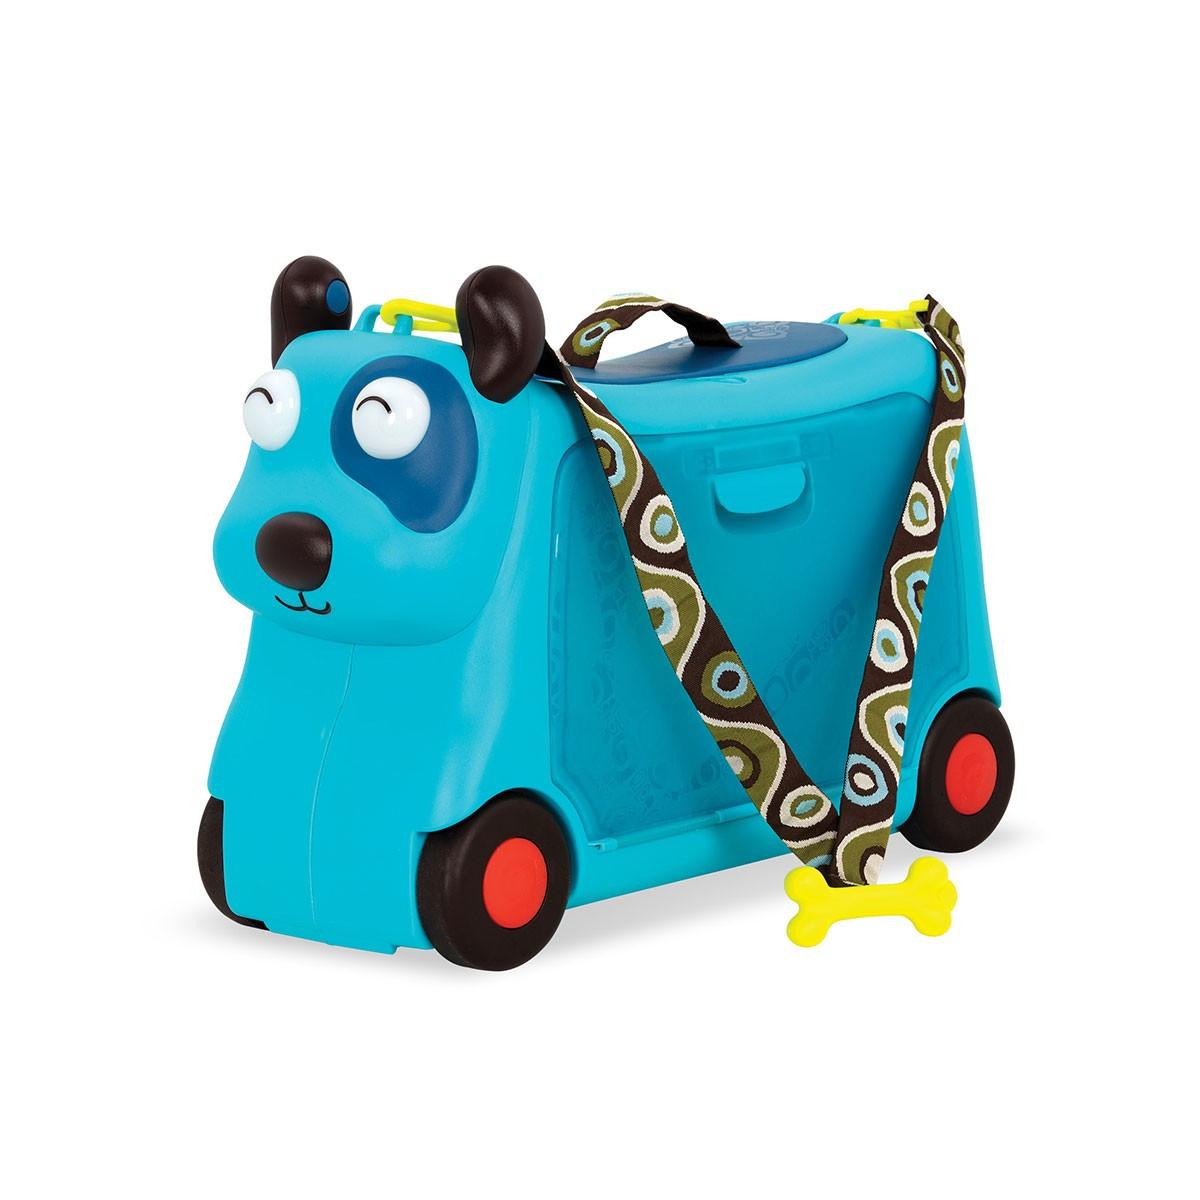 Battat - Детский чемодан-каталка для путешествий - ПЕСИК-ТУРИСТ